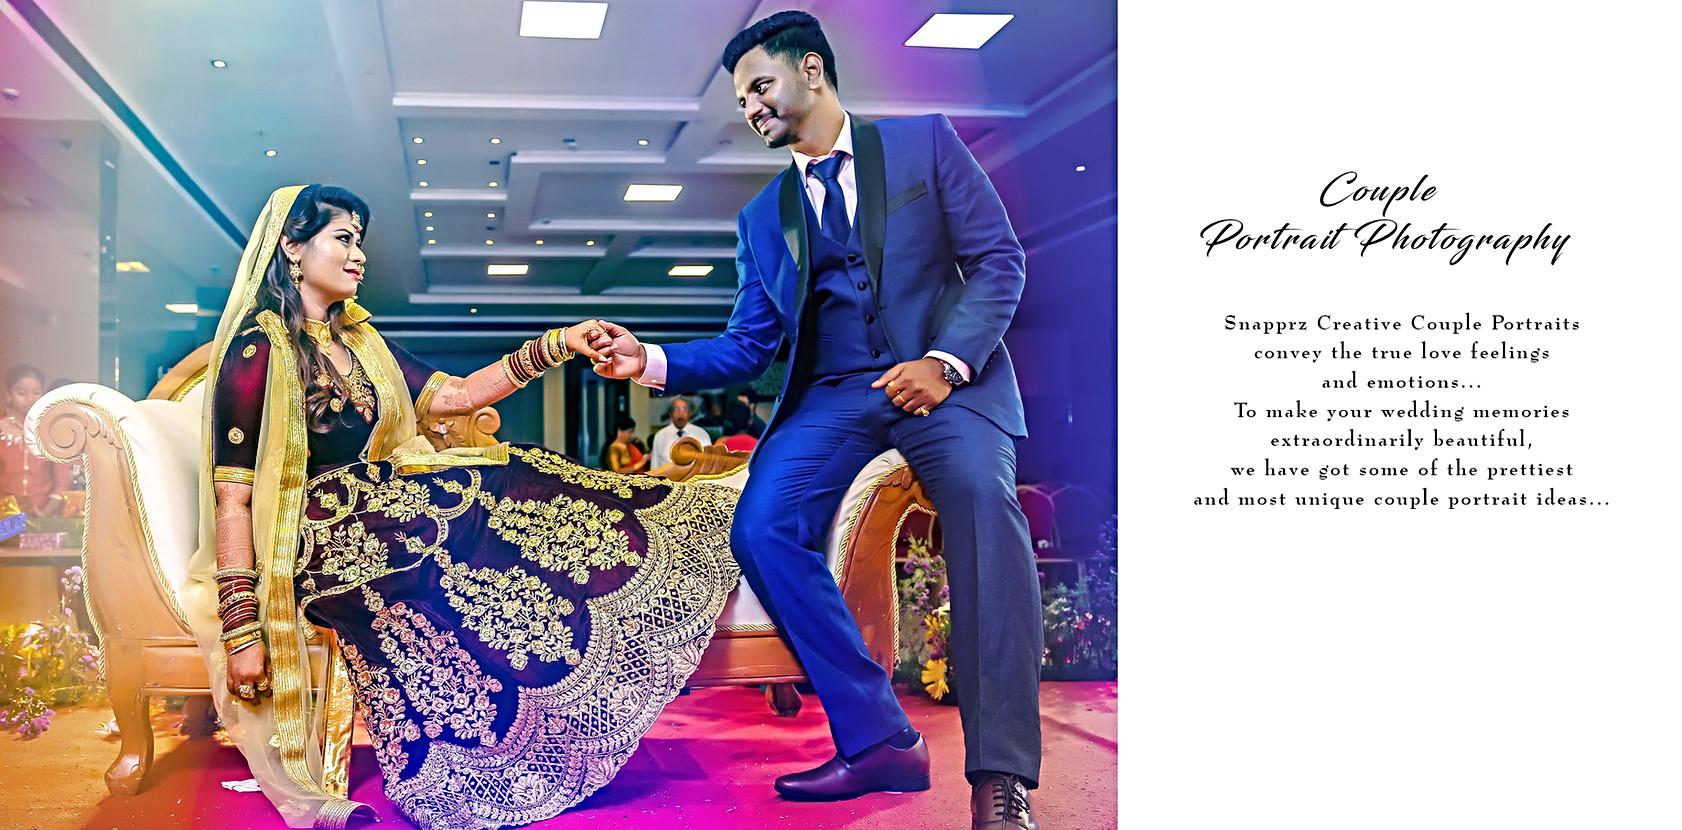 Couple Portrait Photography.jpg